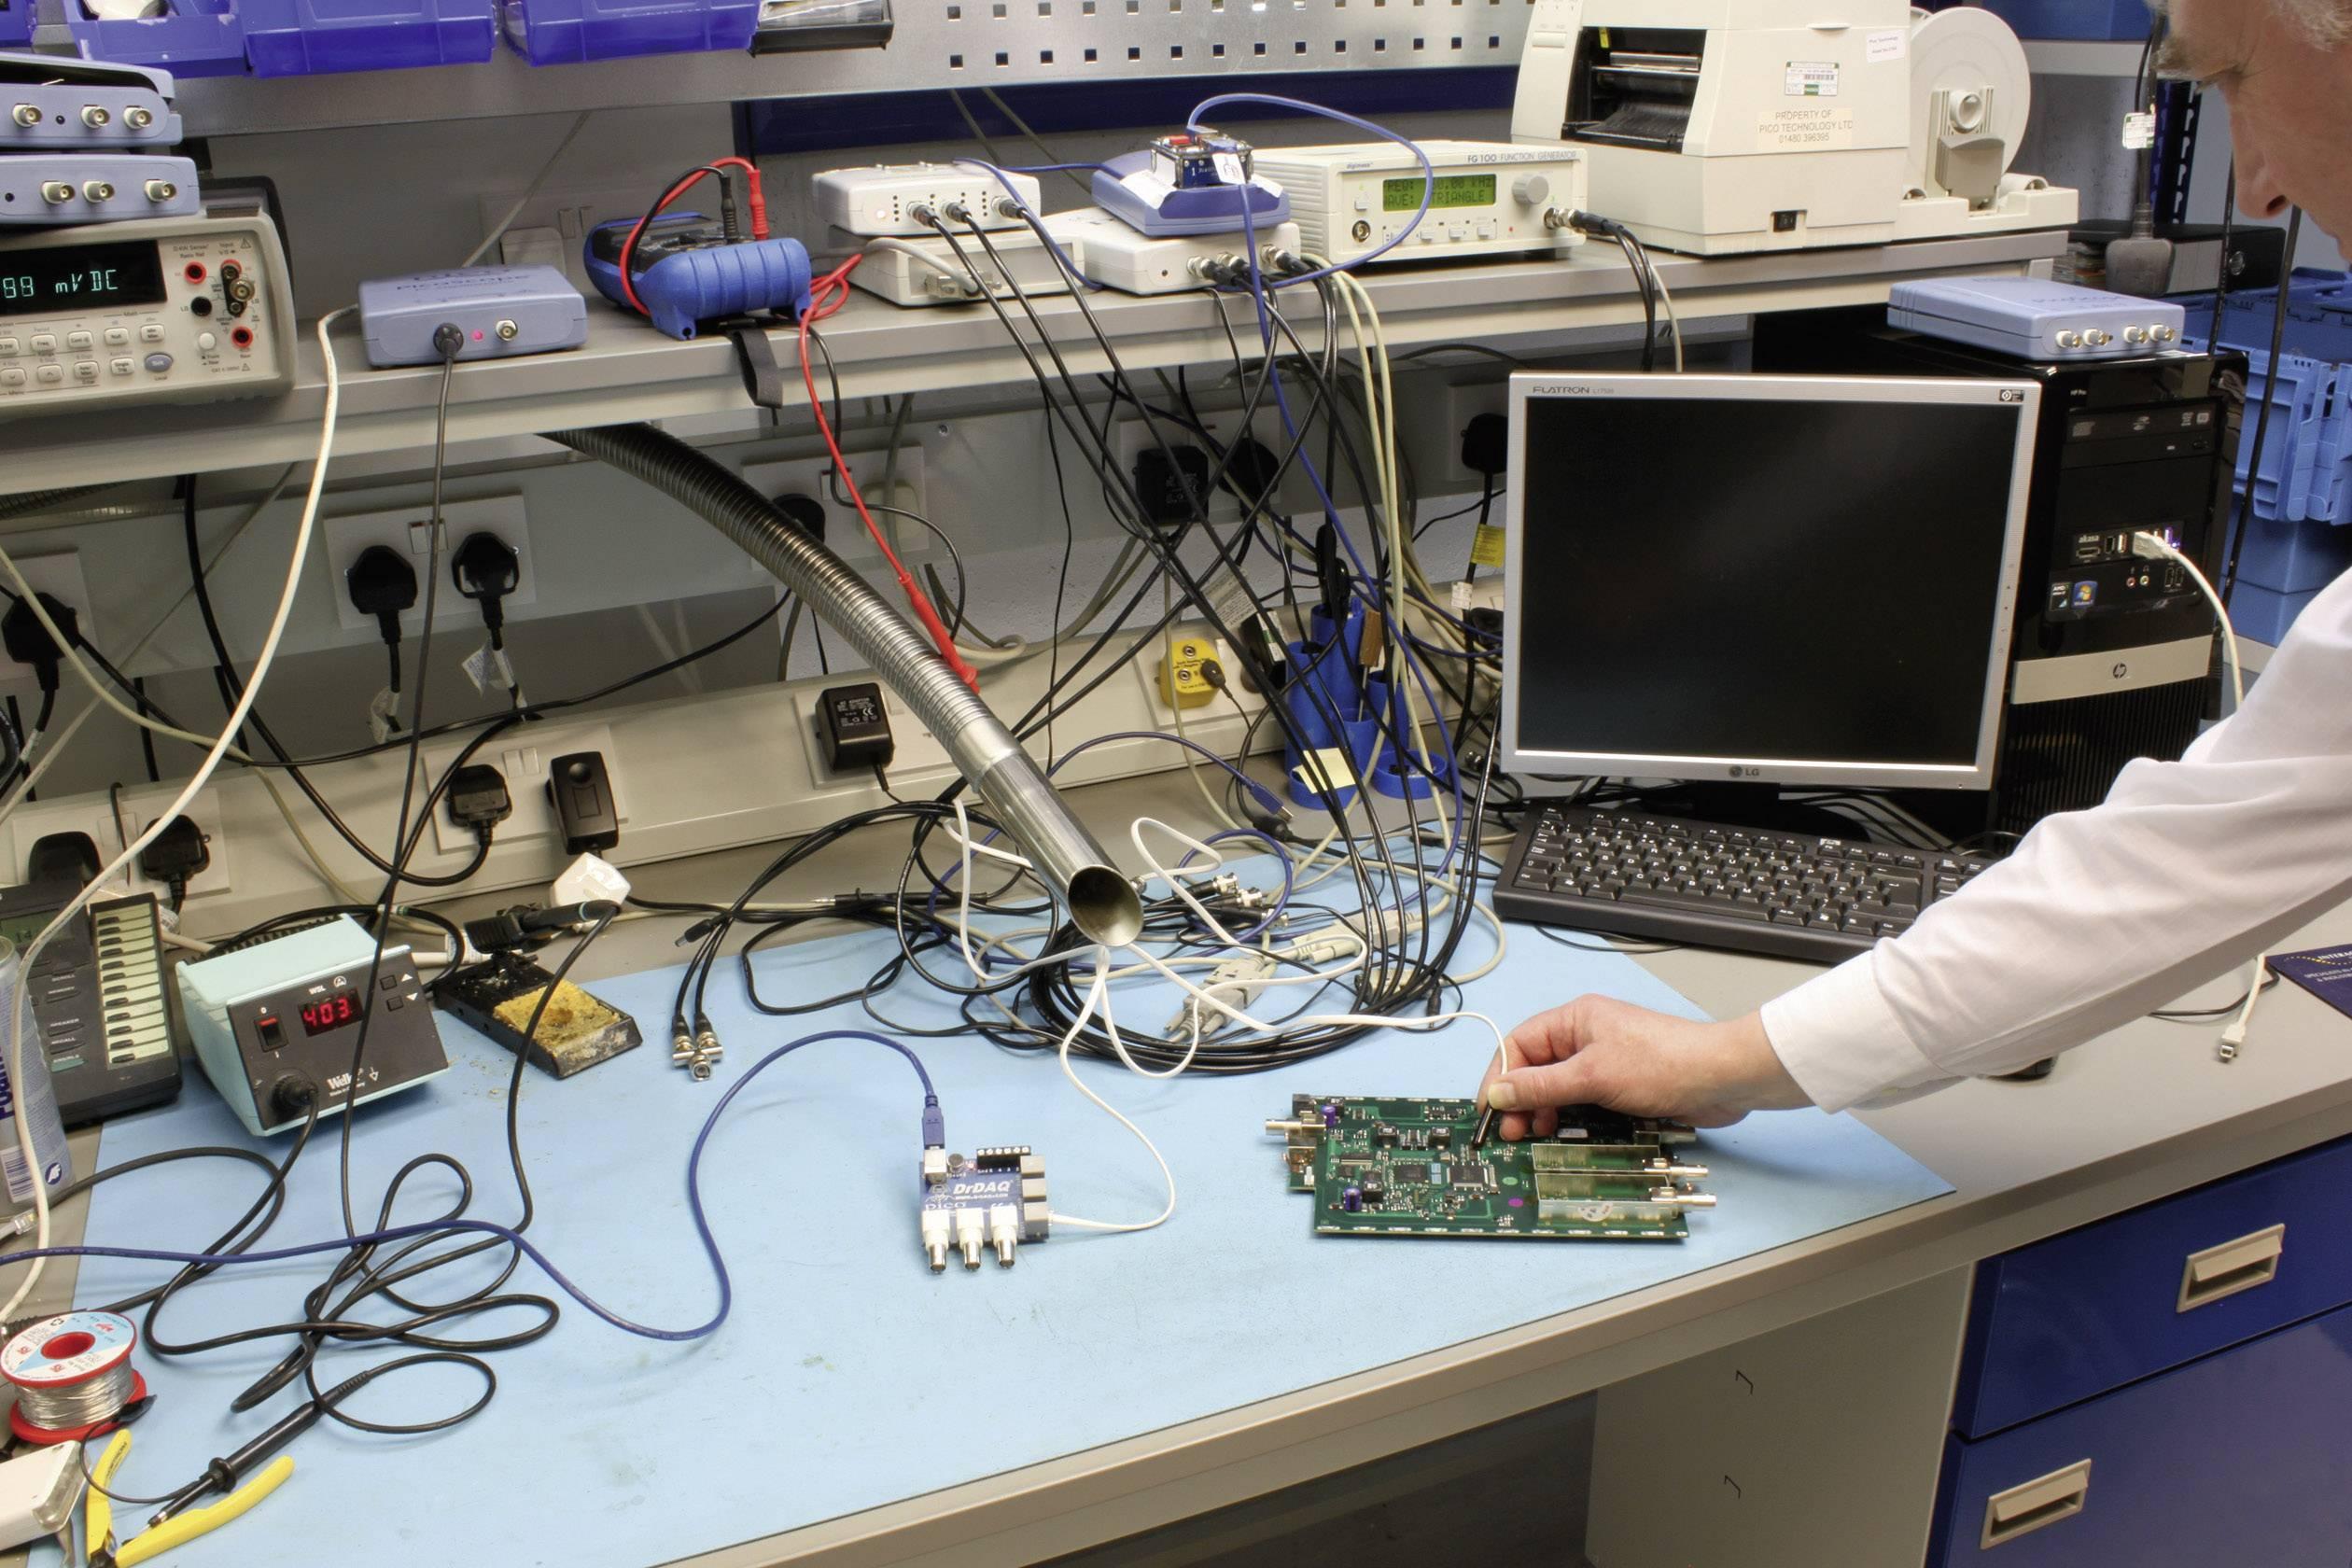 USB záznamník dát, signálny generátor, osciloskop pico DrDAQR